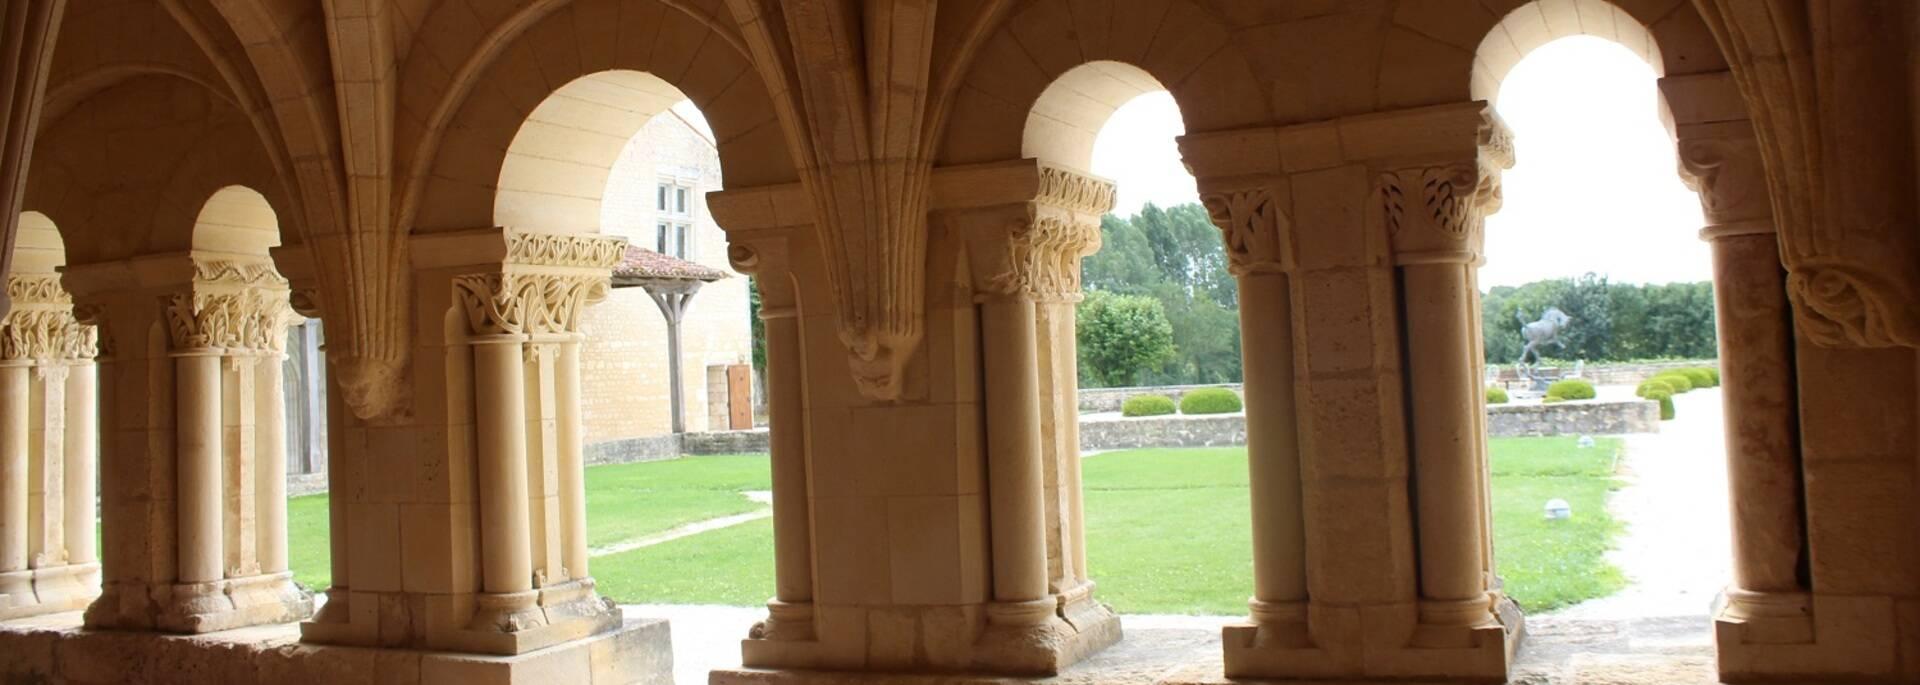 Salle capitulaire de l'Abbaye de Trizay - ©P.Migaud / FDHPA17